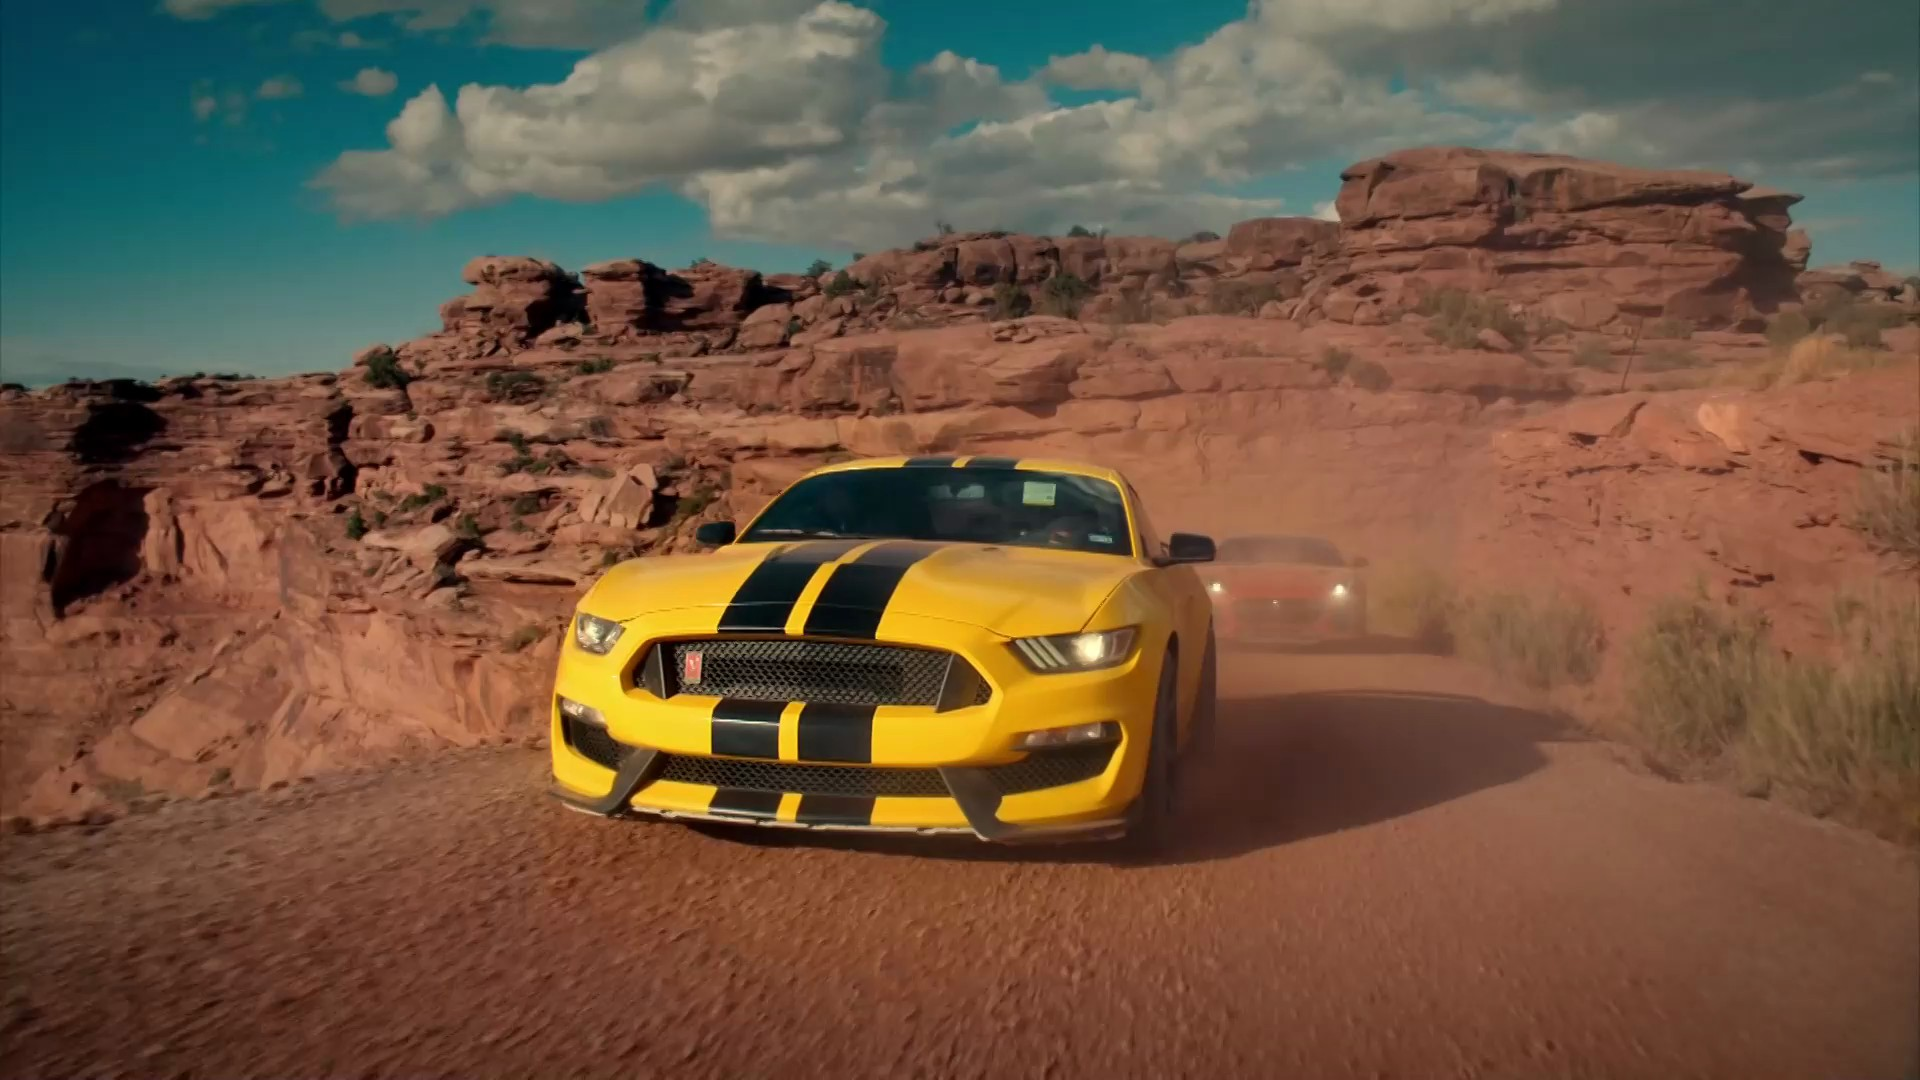 Топ Гир / Top Gear [25x01-02 из 08] (2018) HDTVRip 1080p